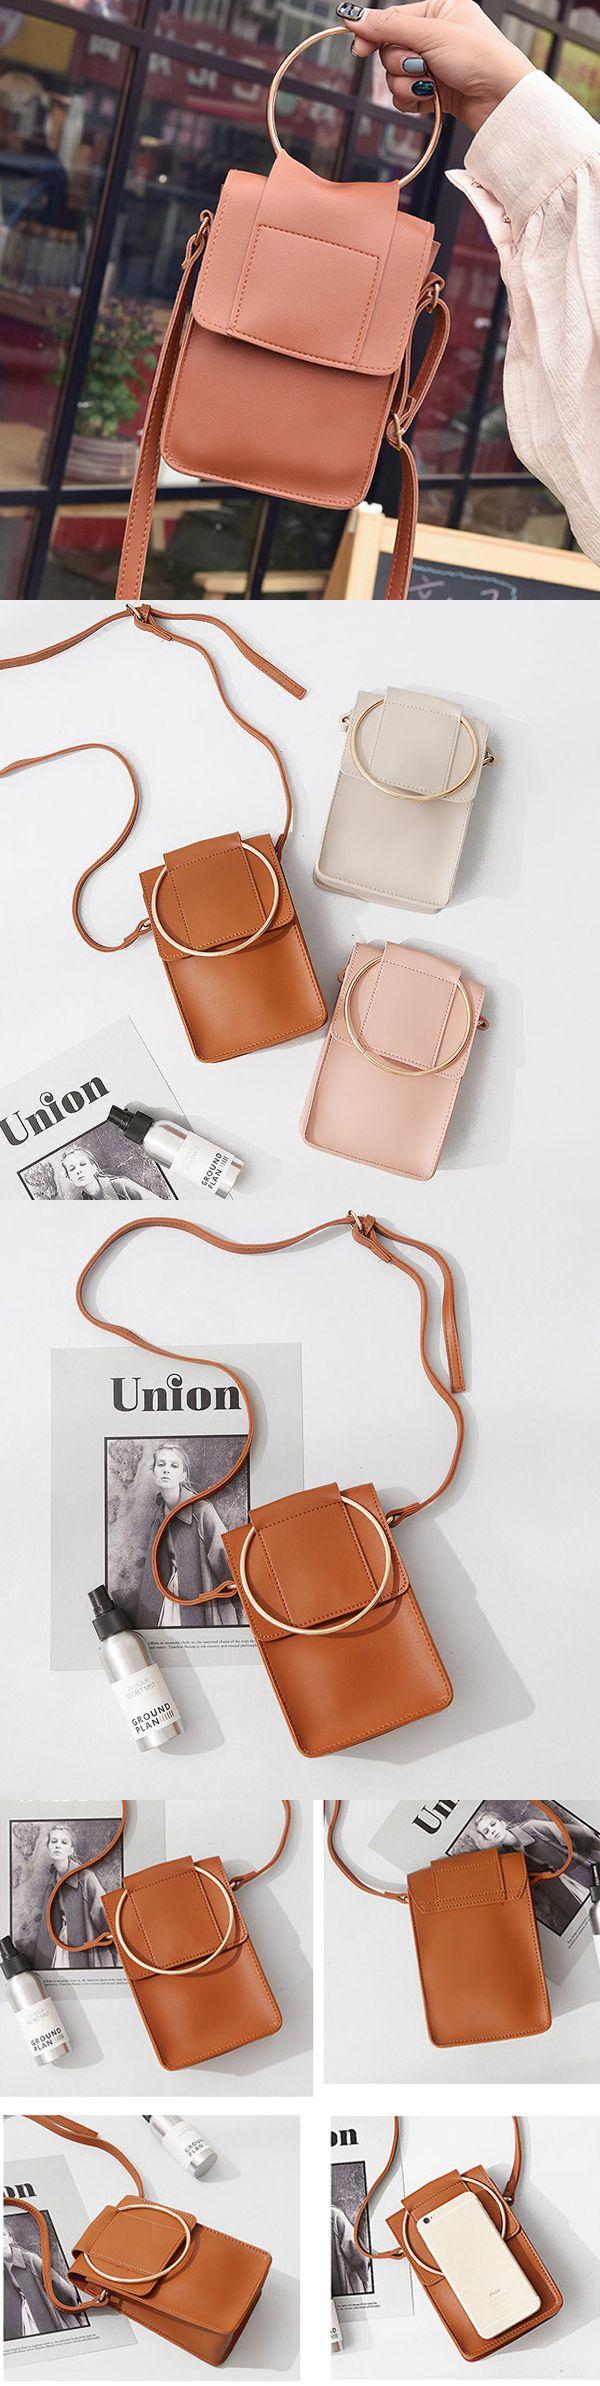 [$ 11.95]  Cute PU Leather Phone Bag Square Mini Crossbody Bag Women Dual-use Handbag